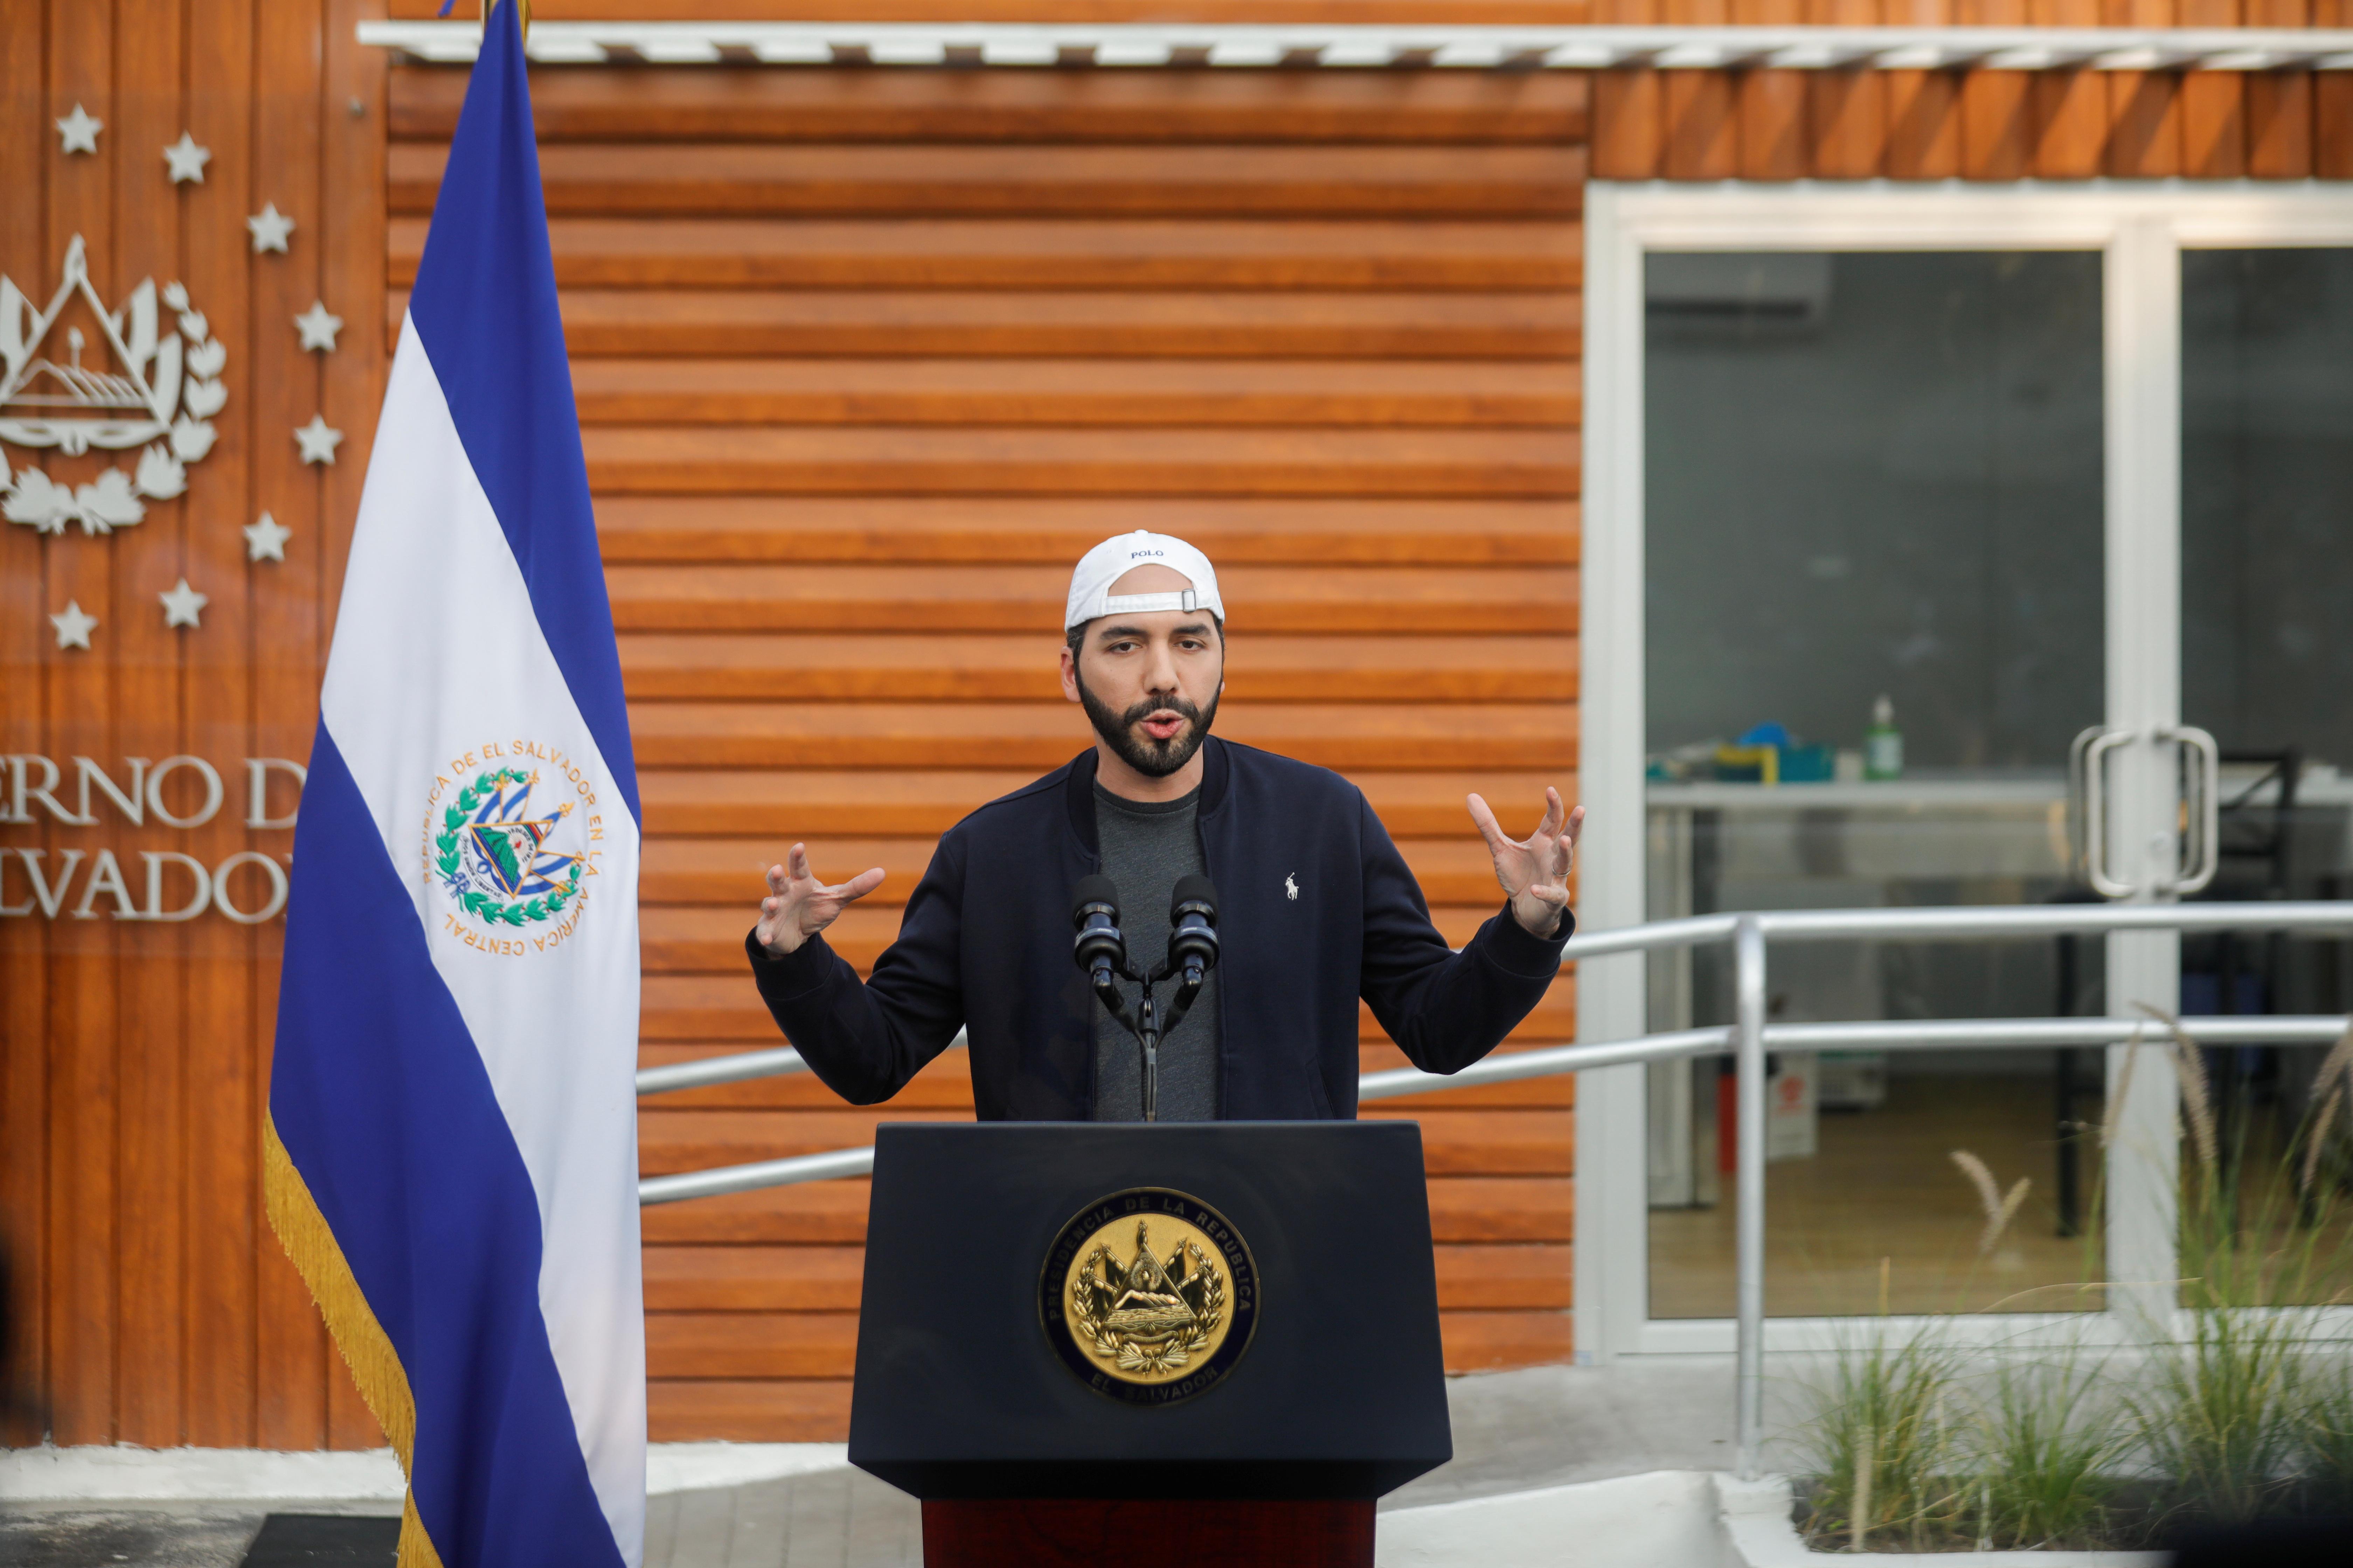 El Salvador's President Nayib Bukele speaks as the coronavirus disease (COVID-19) vaccination started at a public health center in San Salvador, El Salvador, February 17, 2021. REUTERS/Jose Cabezas